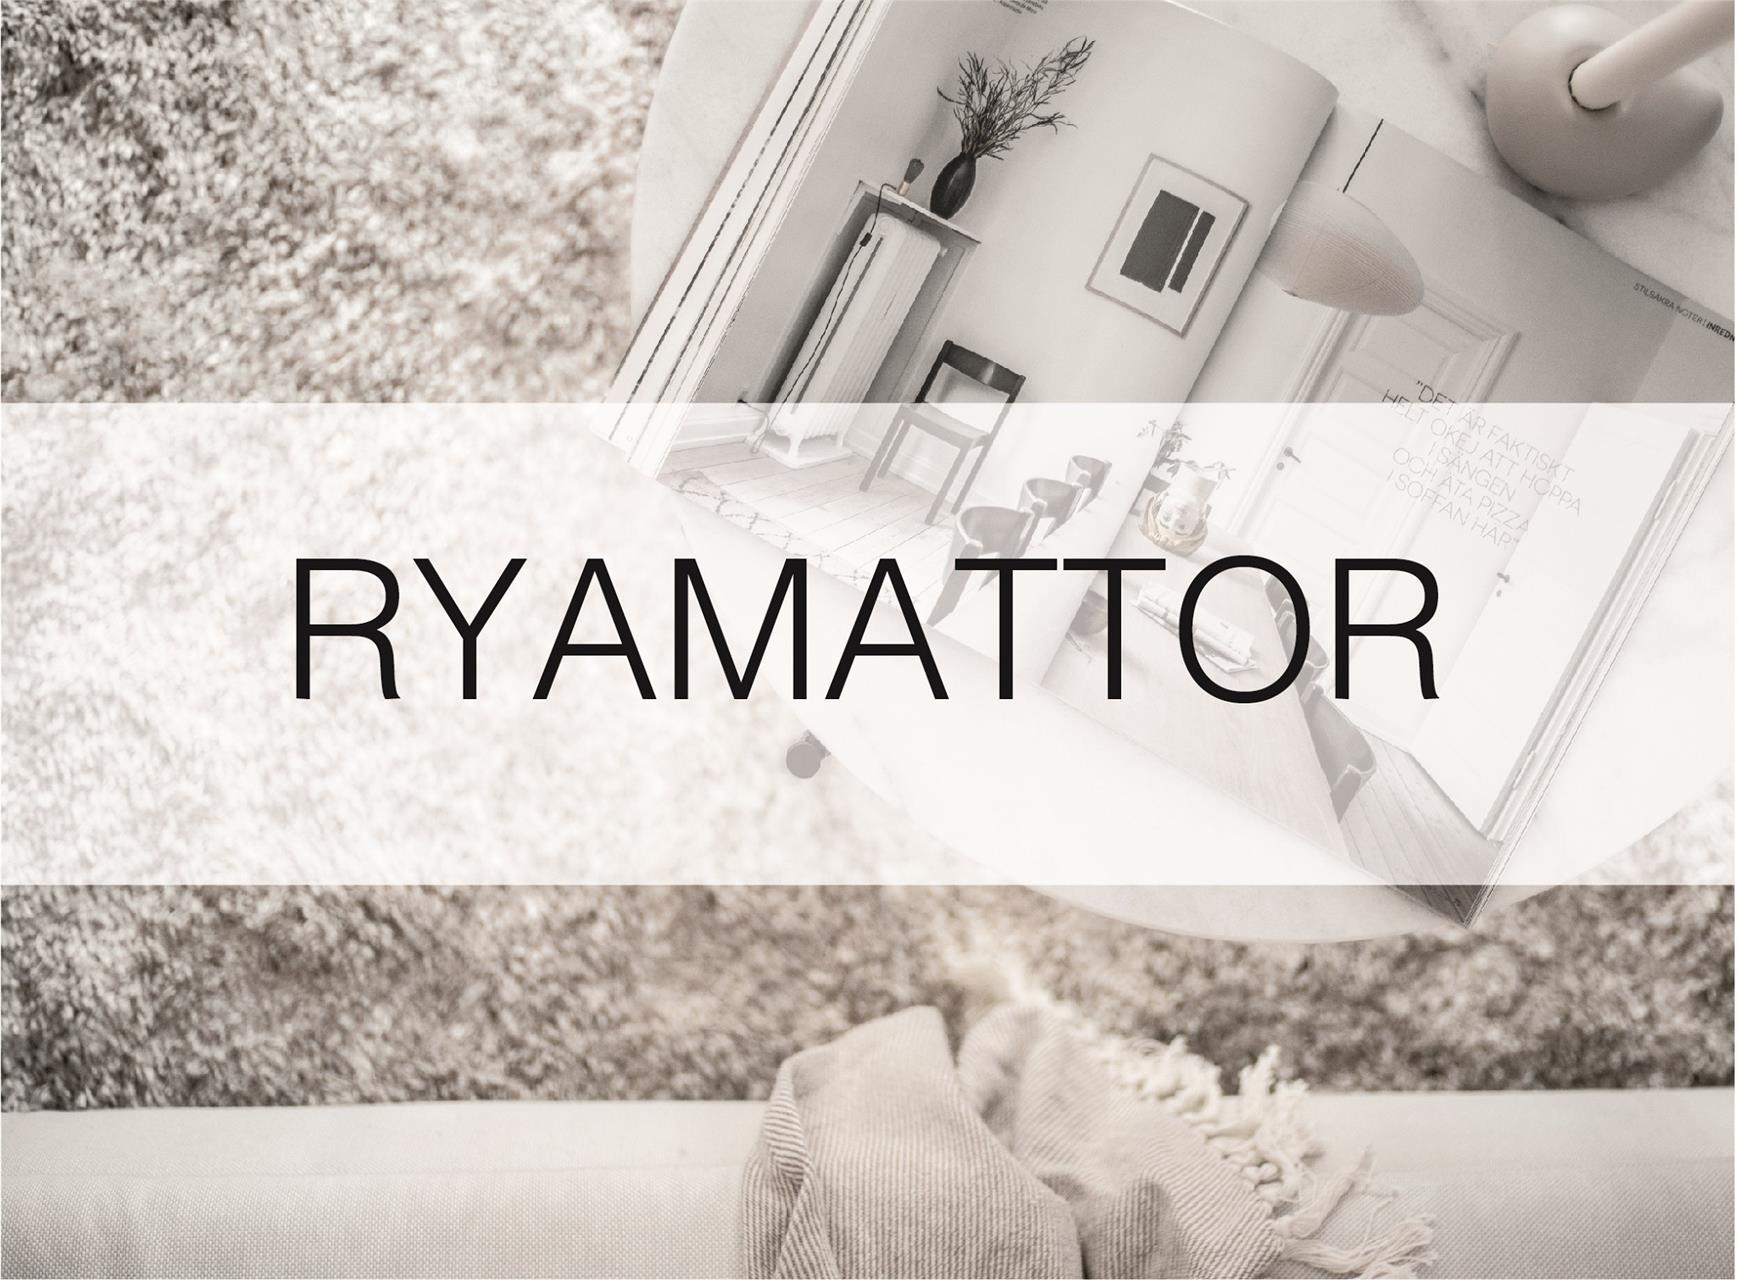 Ryamattor